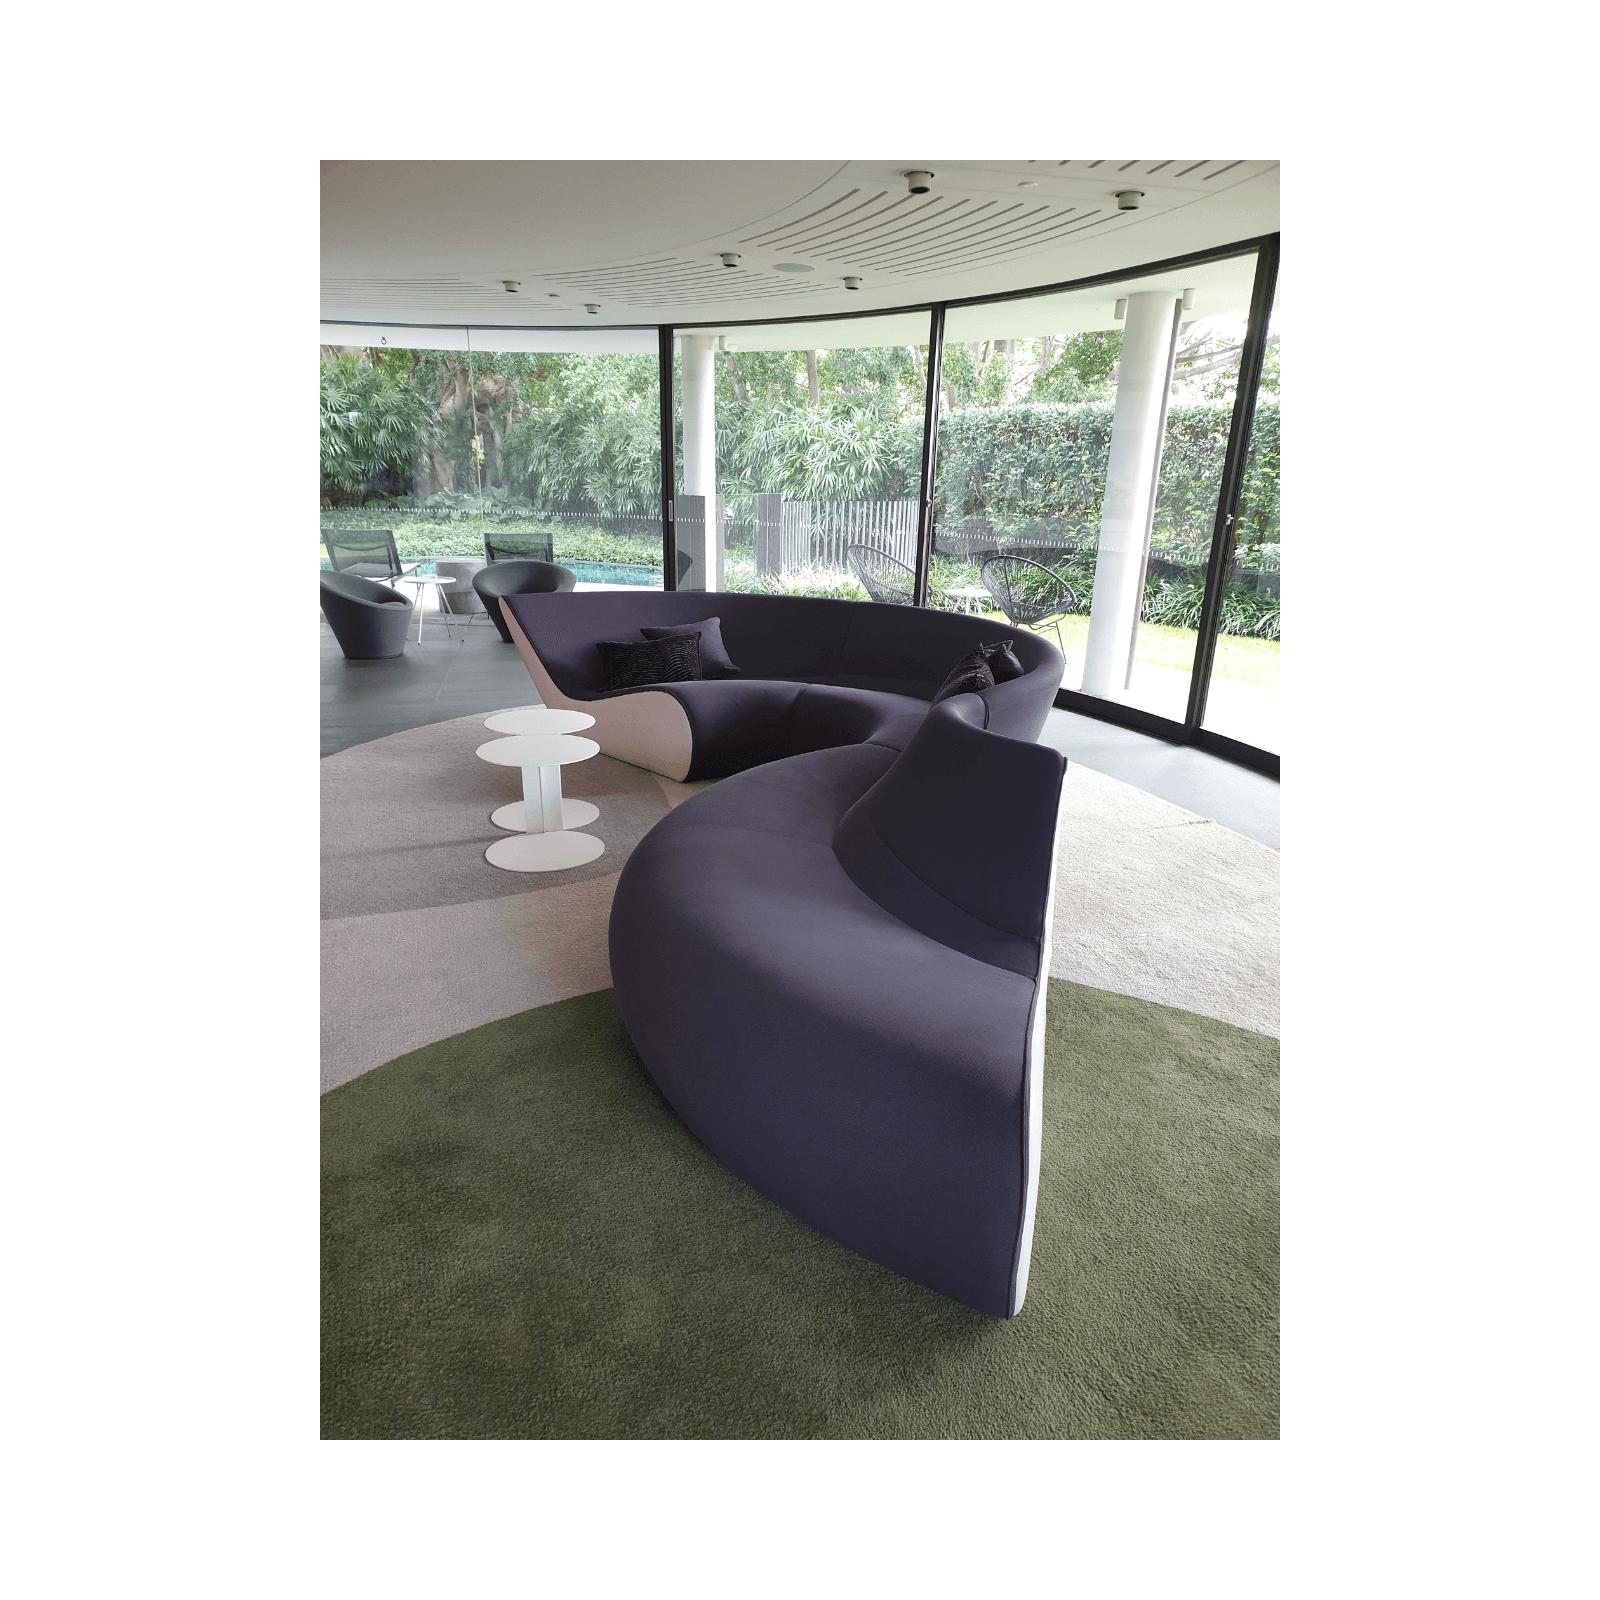 Two Design Lovers Walter Knoll Circle Sofa 1